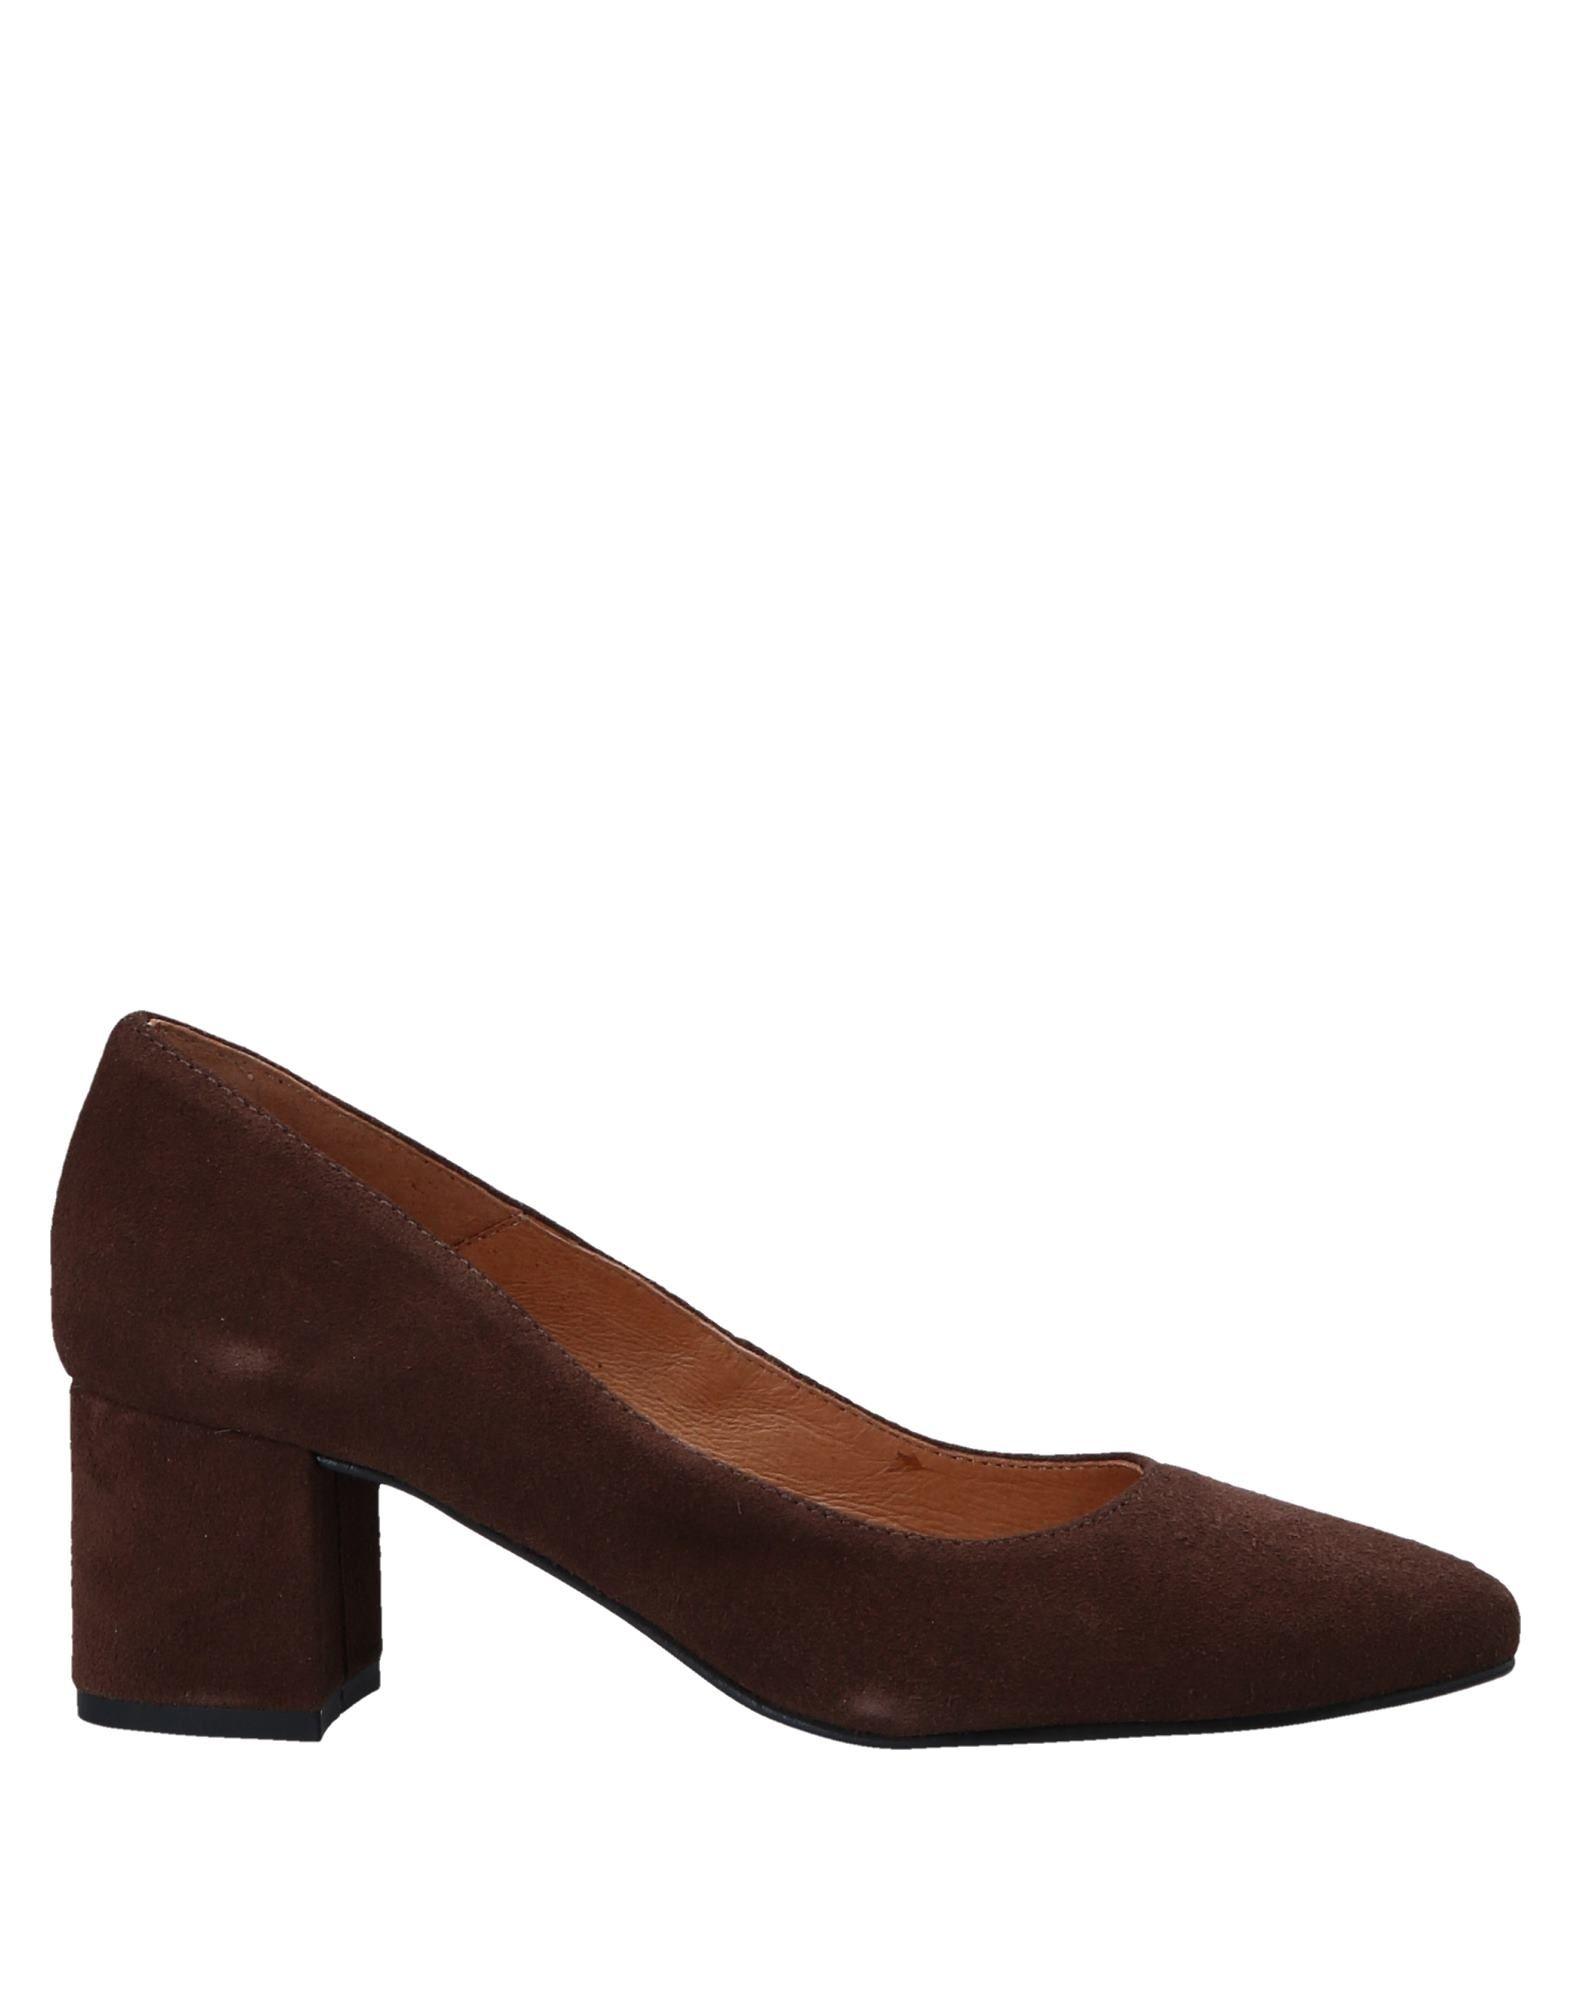 Apologie Pumps Damen  11548250HT Gute Qualität beliebte Schuhe